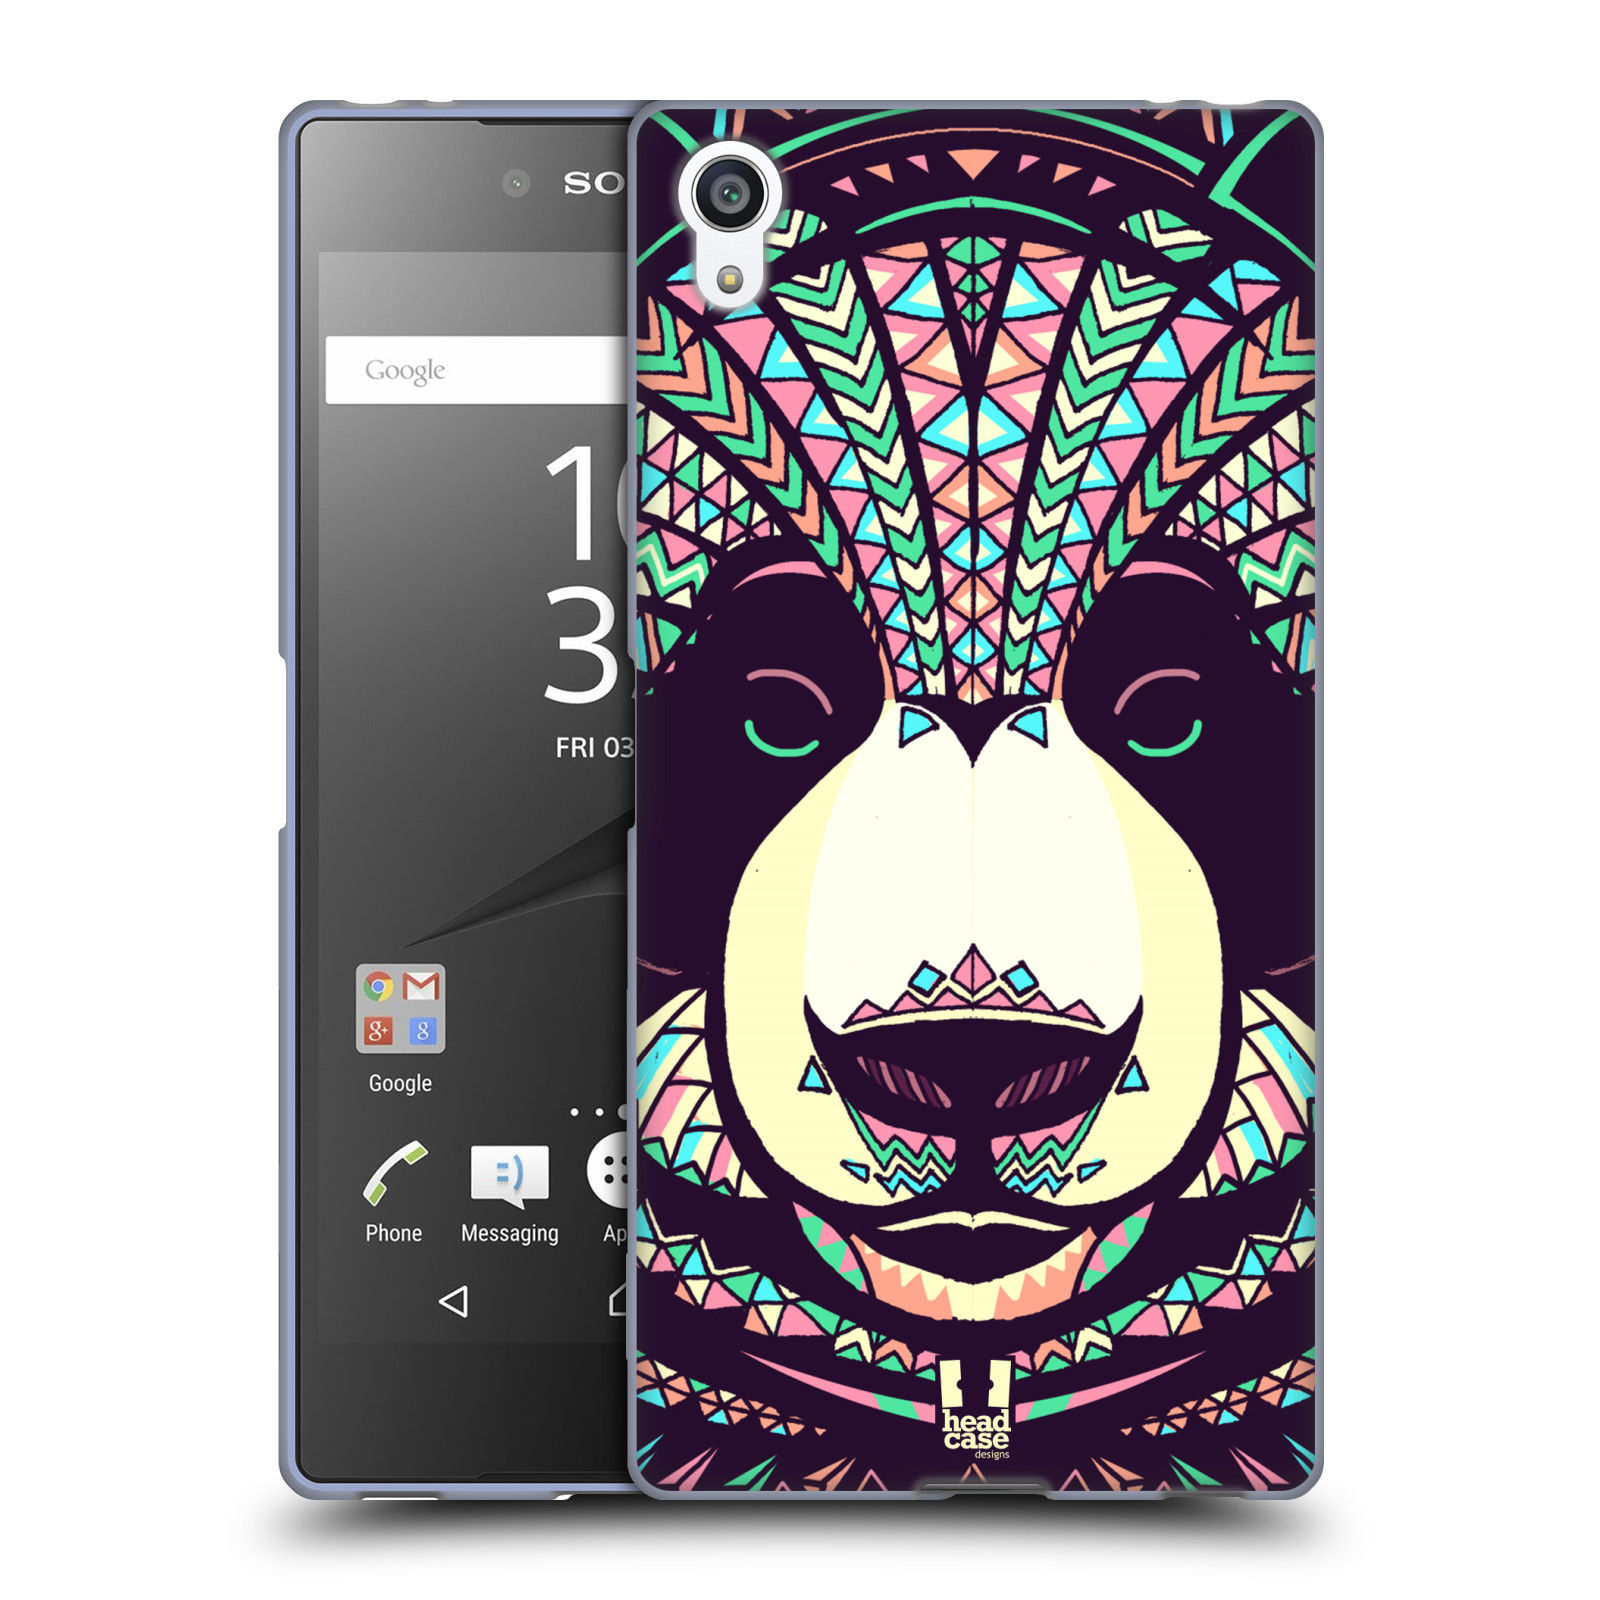 Silikonové pouzdro na mobil Sony Xperia Z5 Premium HEAD CASE AZTEC PANDA